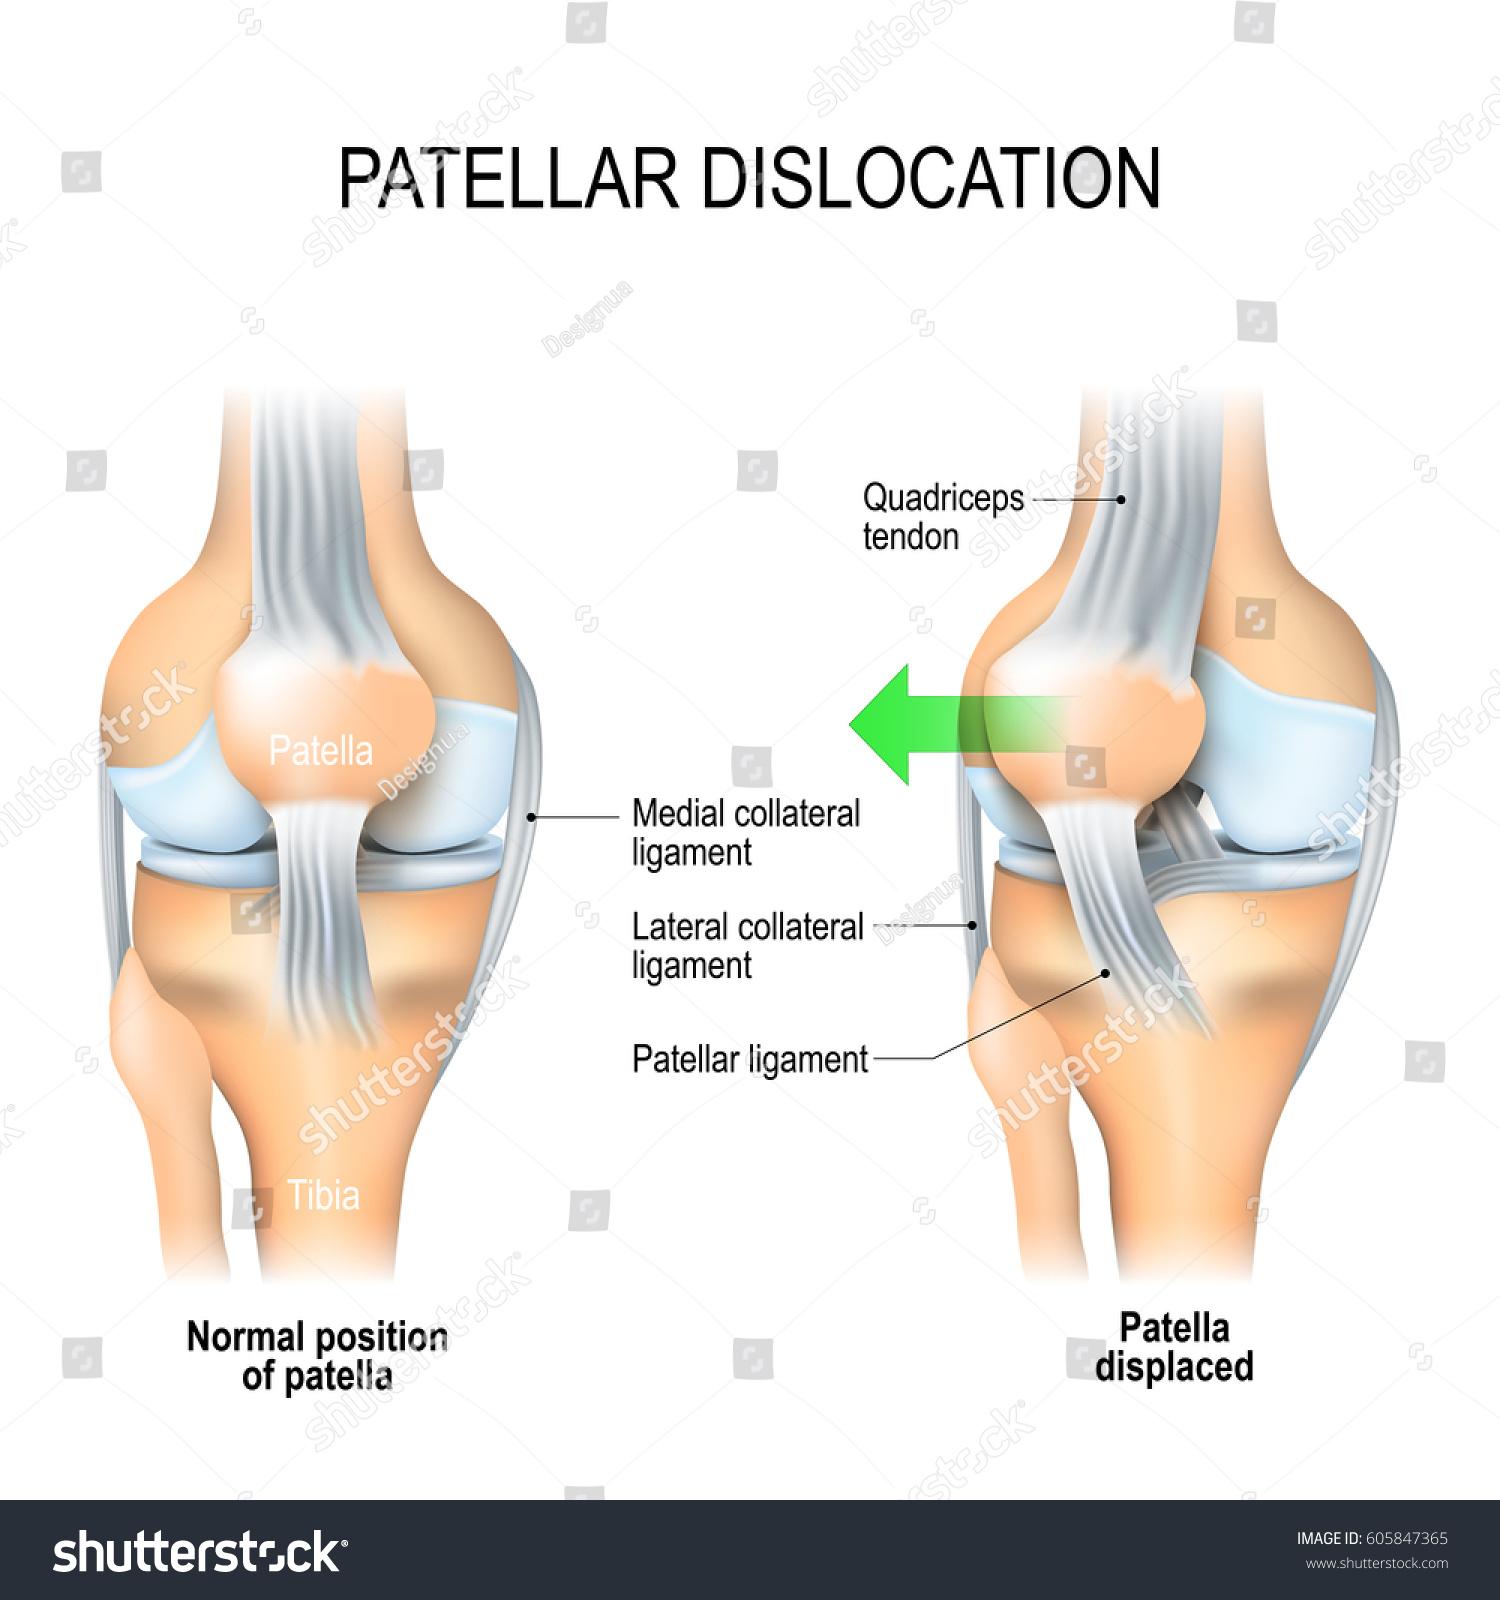 Patellar Dislocation Normal Position Kneecap Patella Stockvector ...